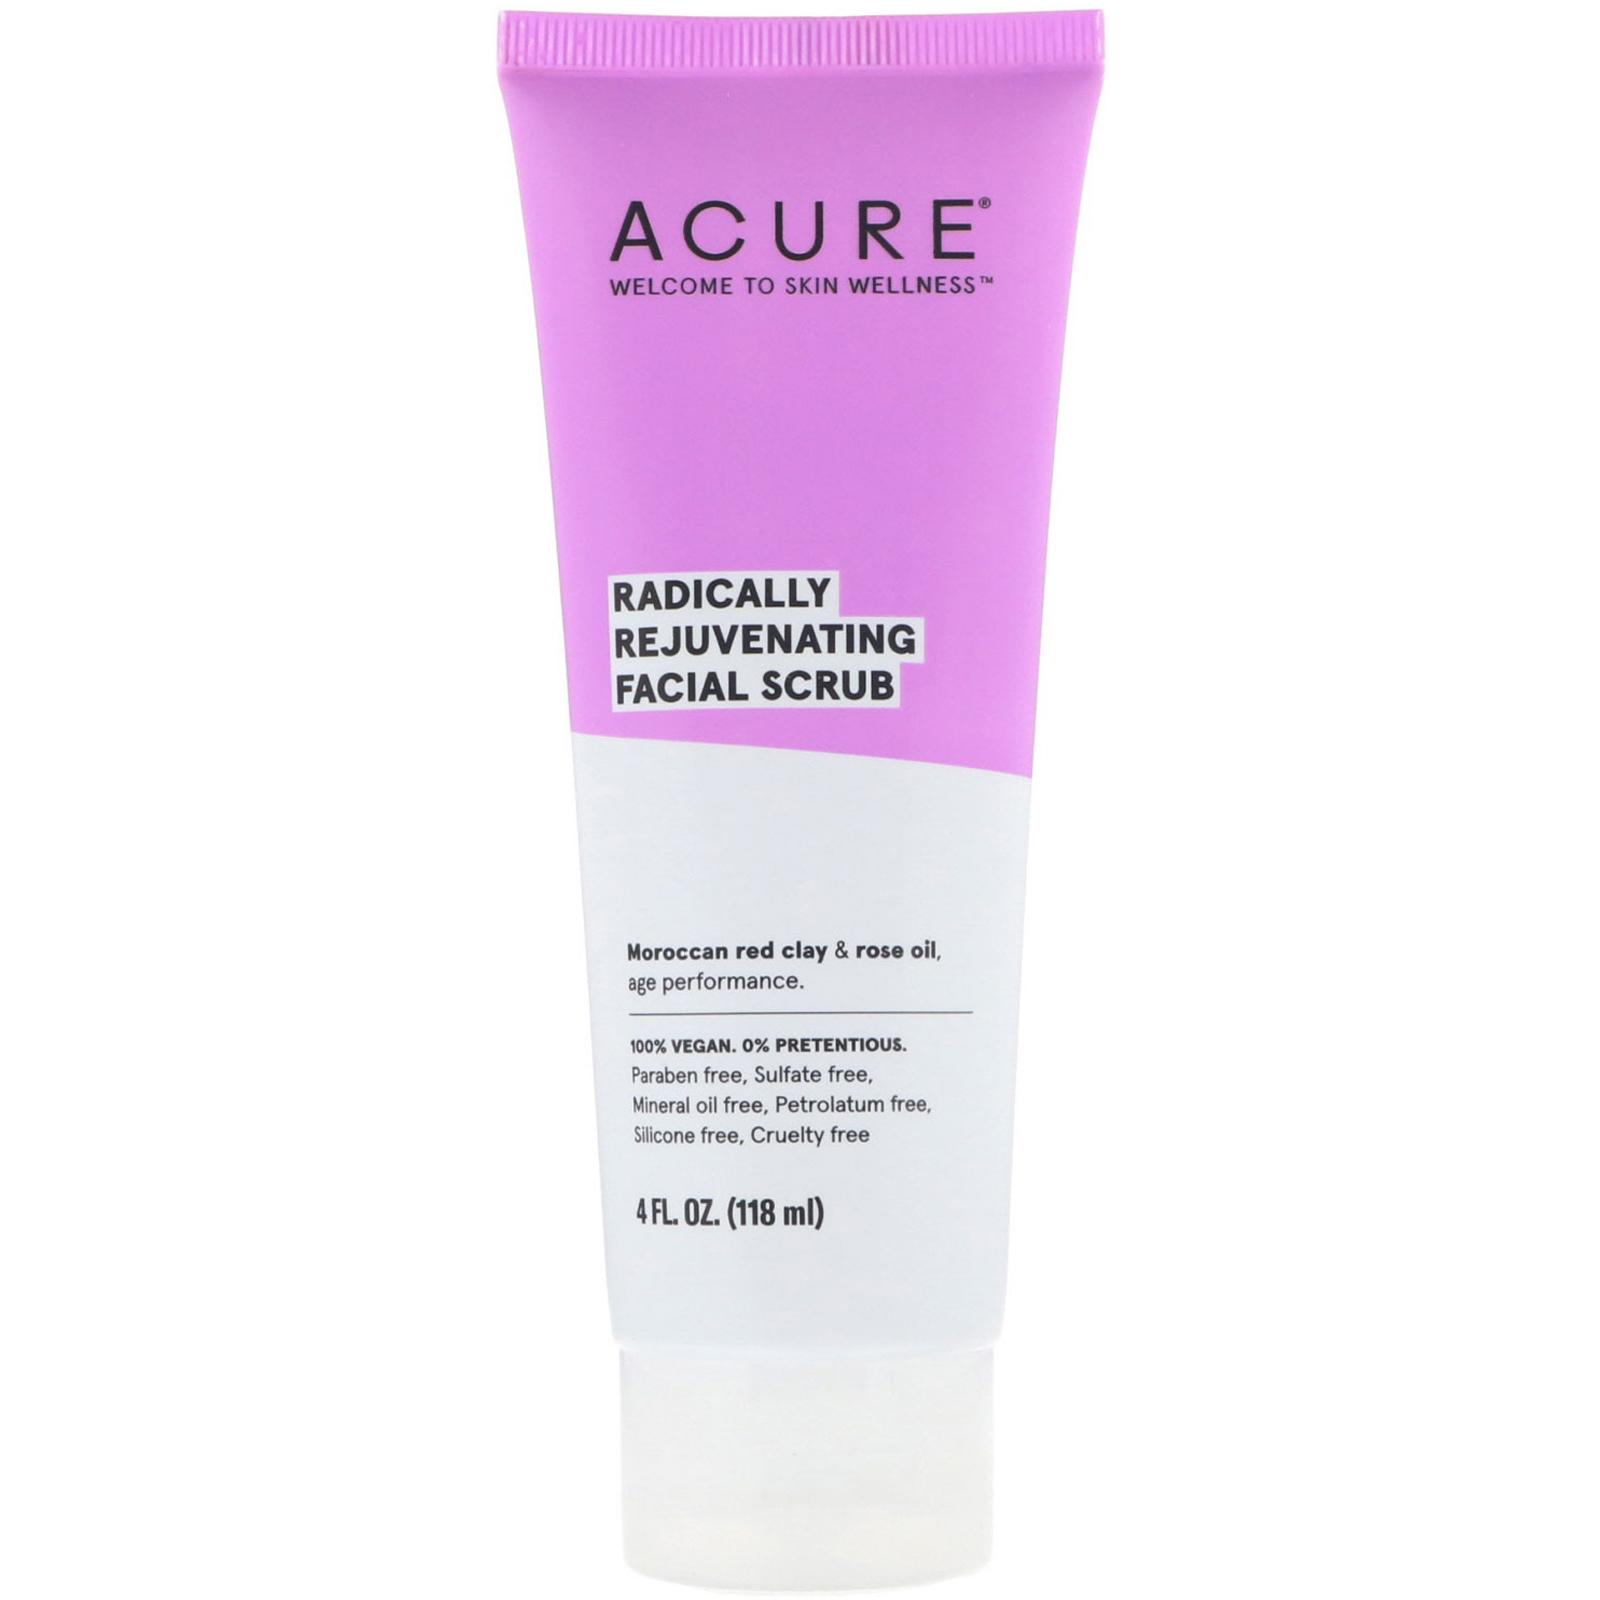 Acure Organics Radically Rejuvenating Facial Scrub 4 Fl Oz